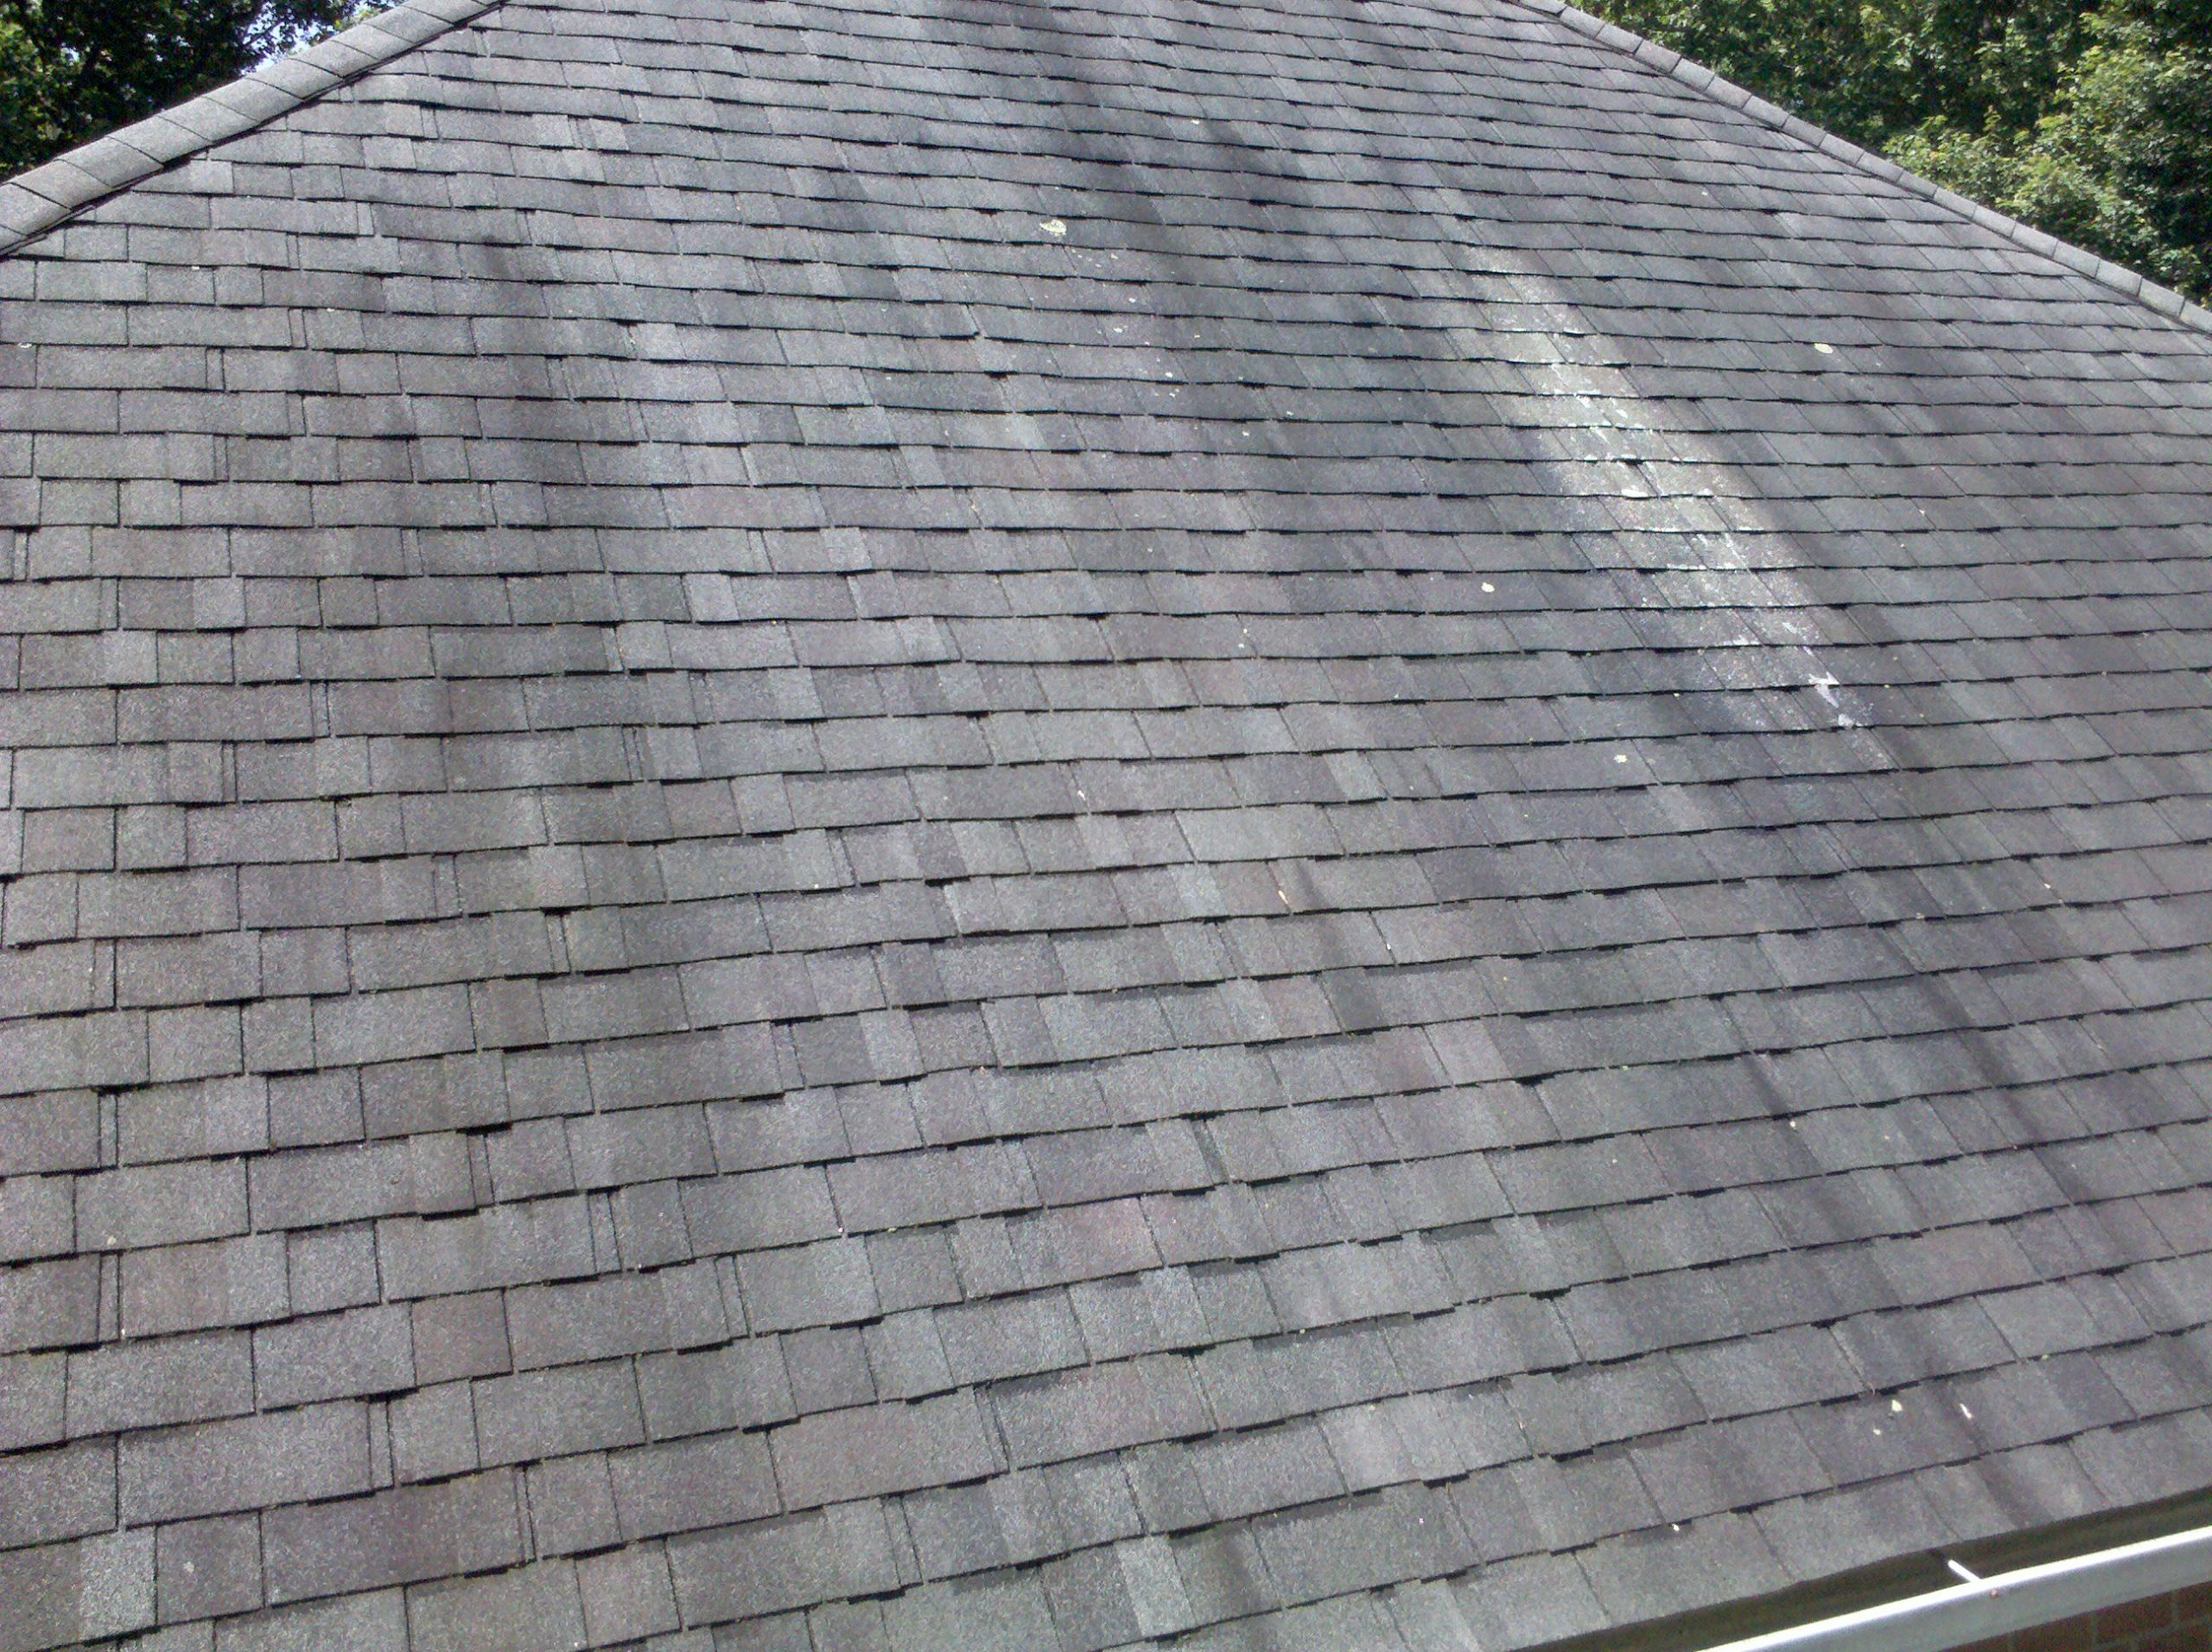 Metal Roof Cost vs Asphalt Roof Cost